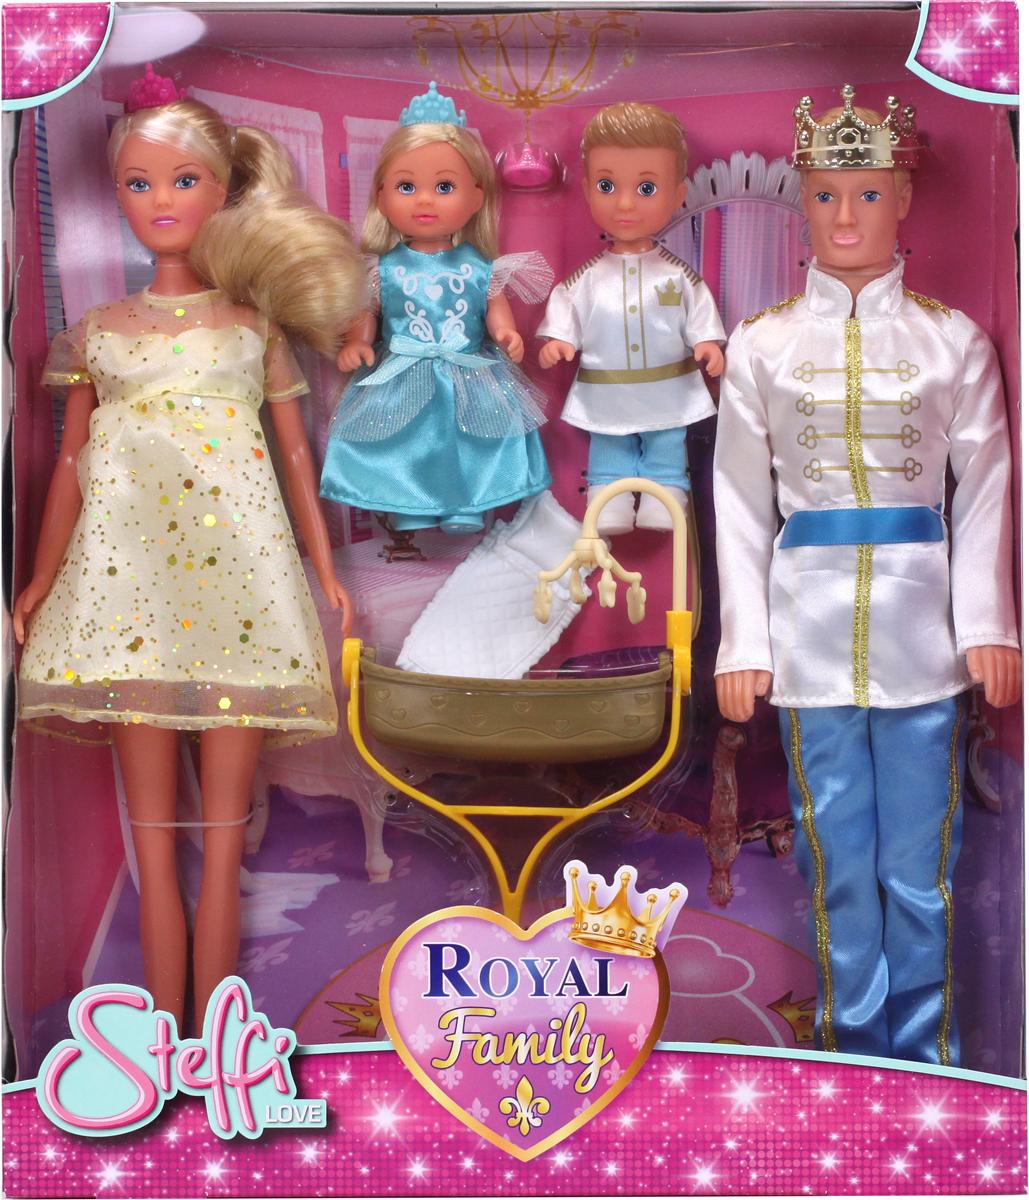 Simba Набор кукол Штеффи Кевин Еви Тимми Королевская семья набор кукол simba штеффи и еви принцессы